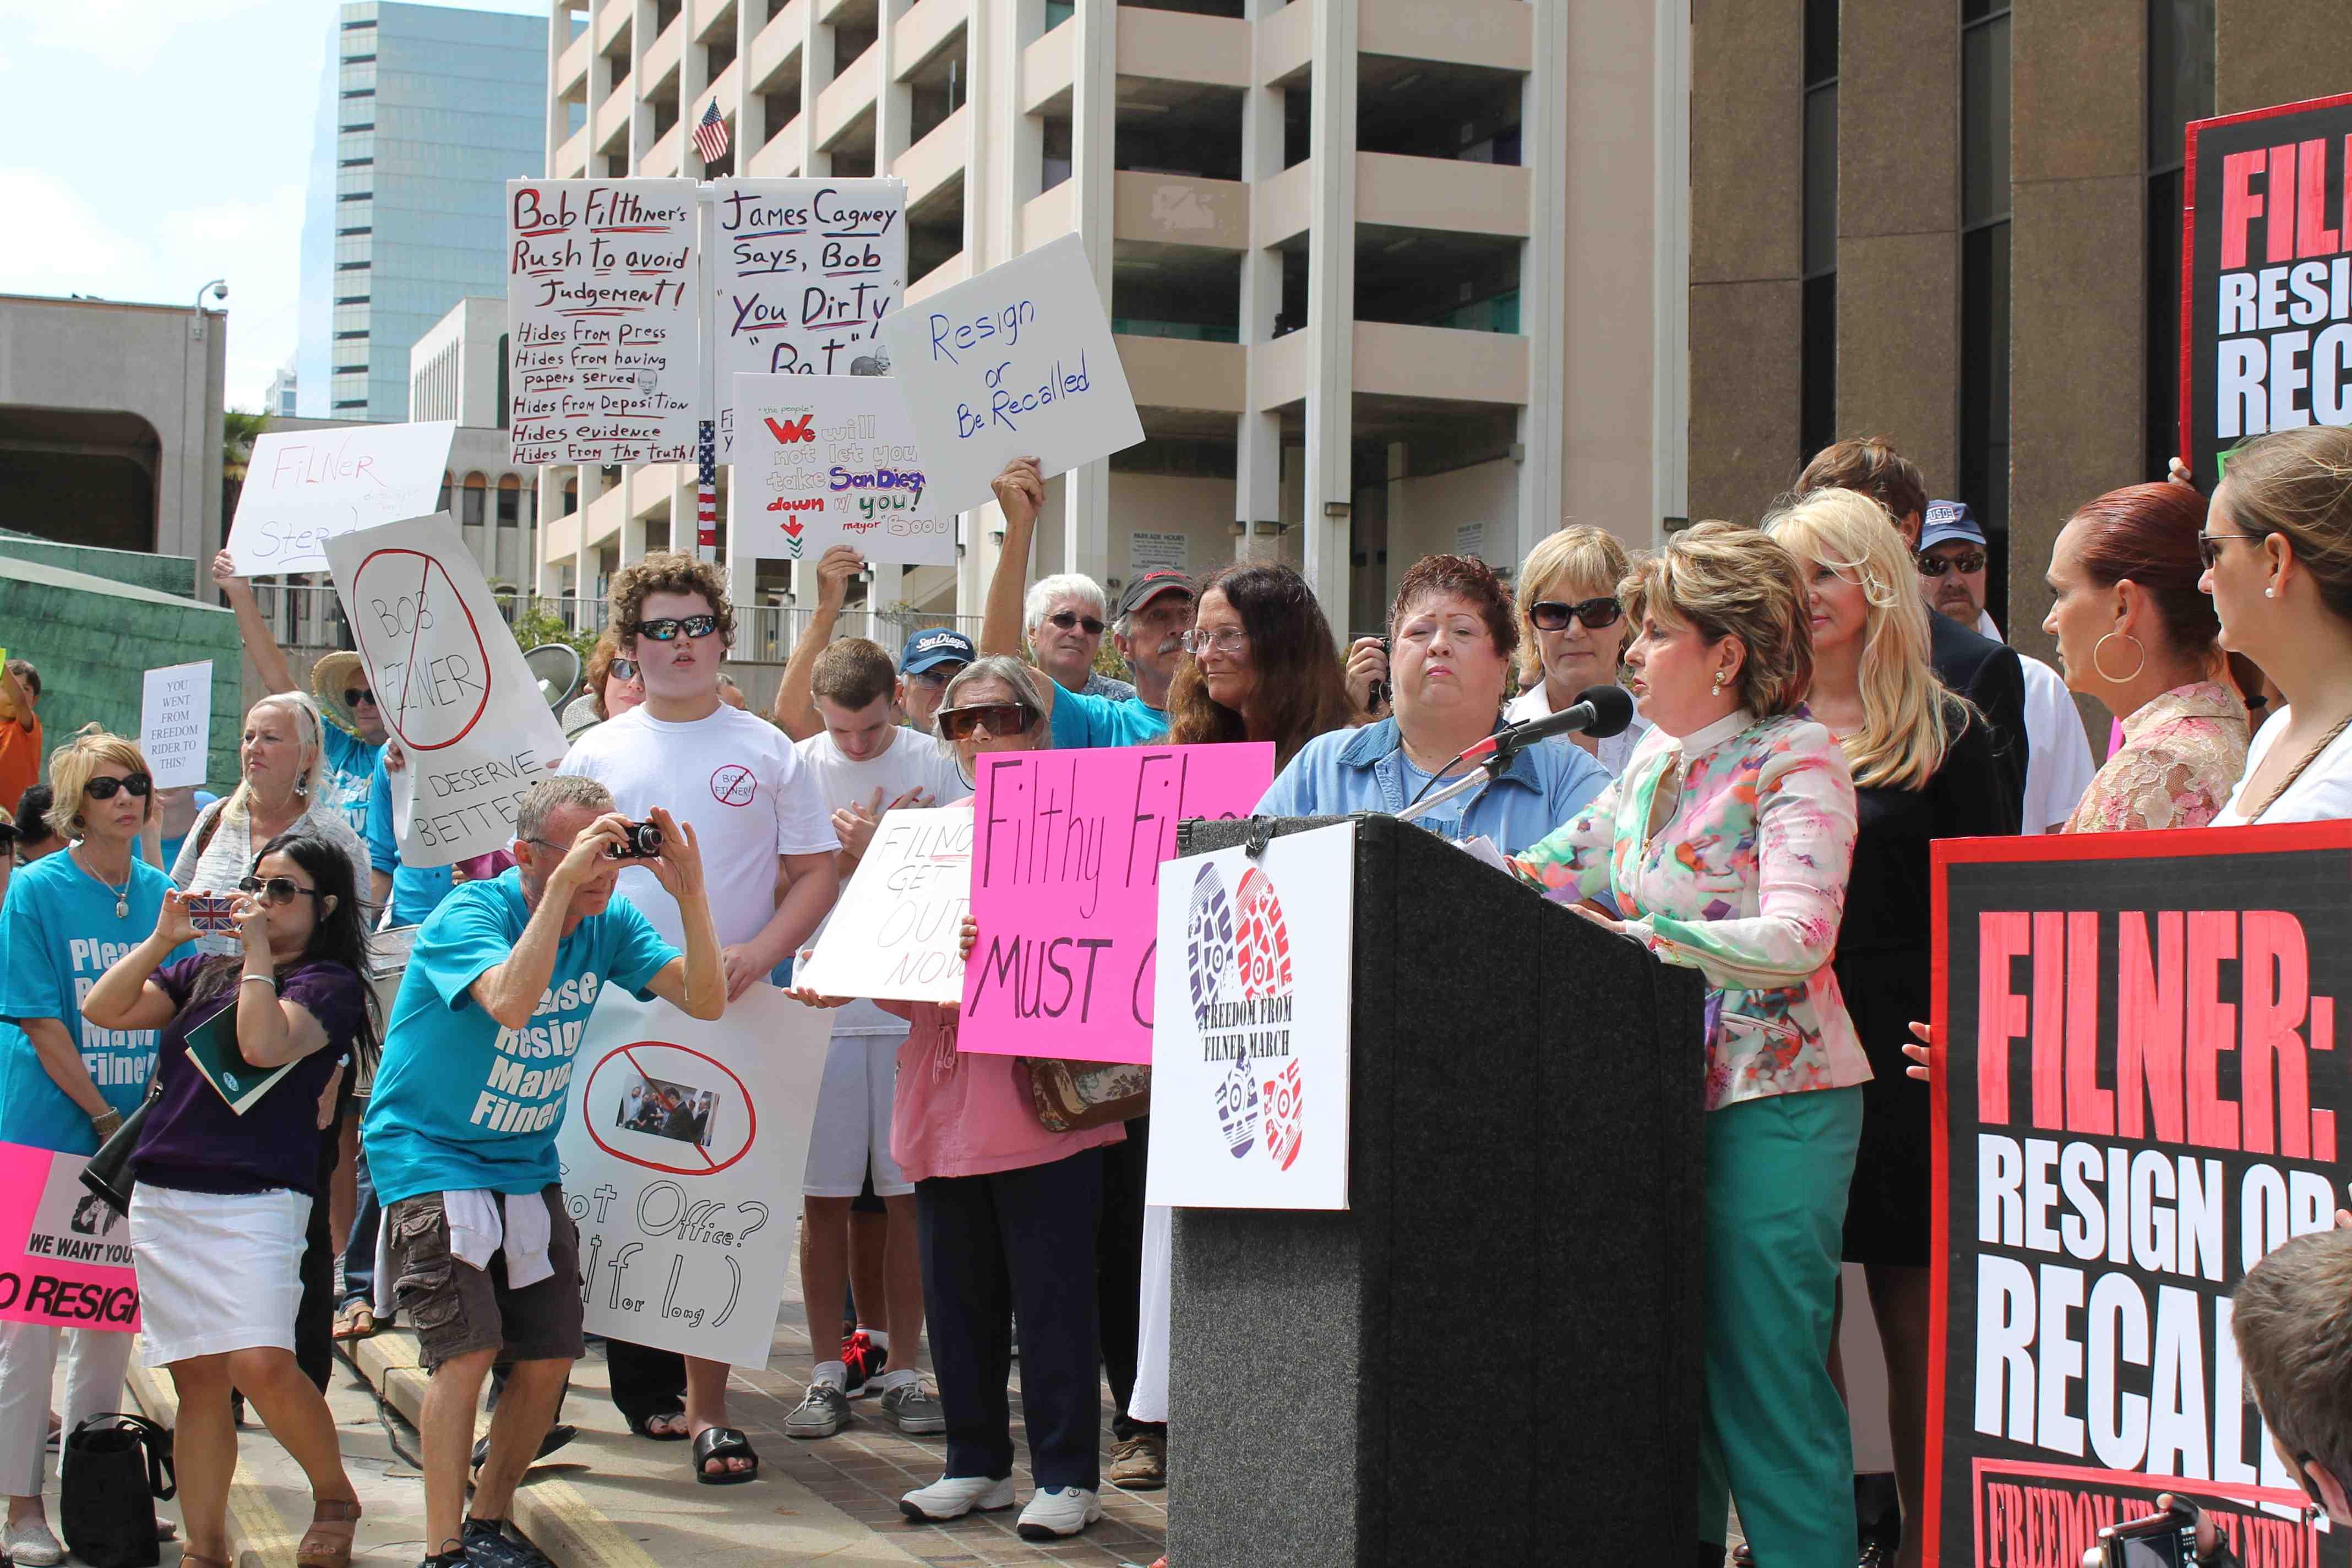 Hundreds March to Recall San Diego's Mayor Filner